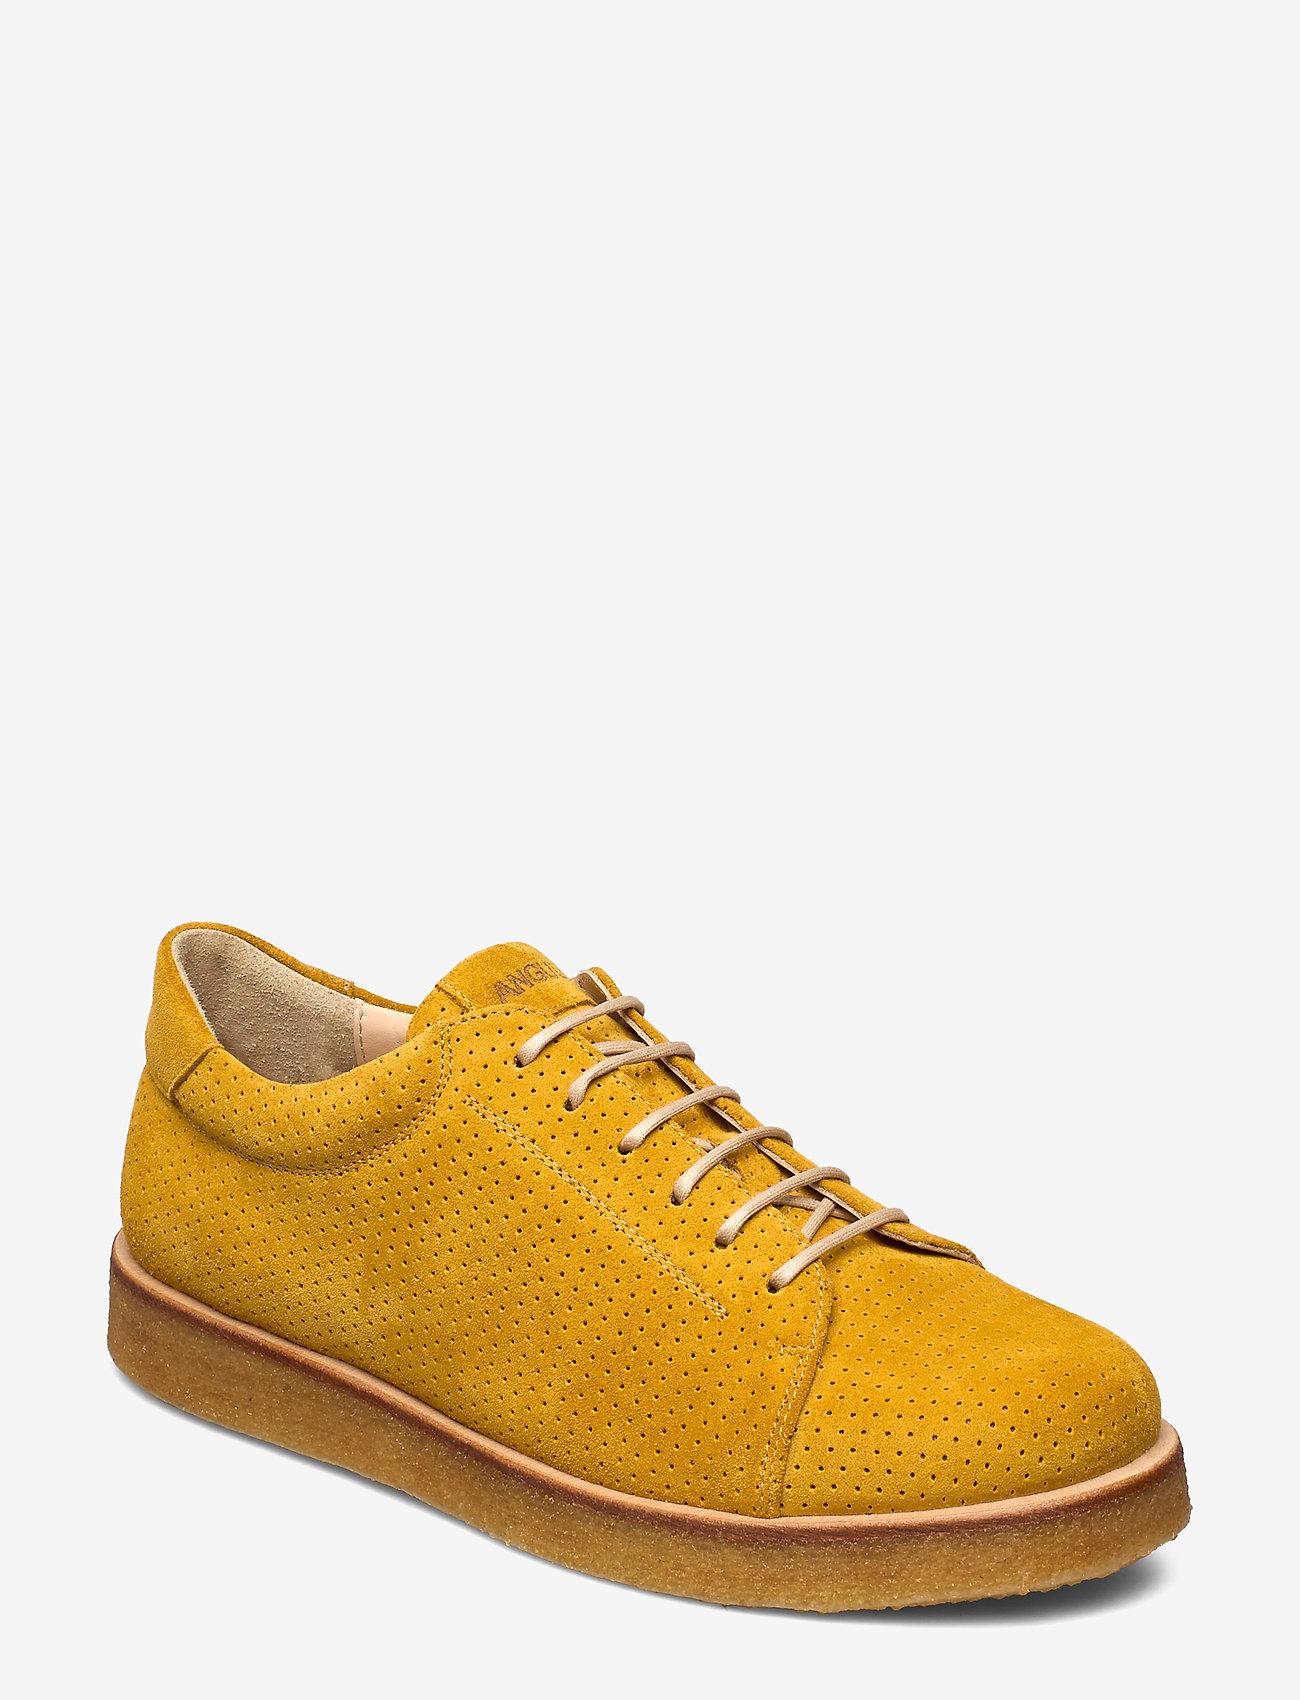 ANGULUS - Shoes - flat - with lace - buty sznurowane - 2201 yellow - 0